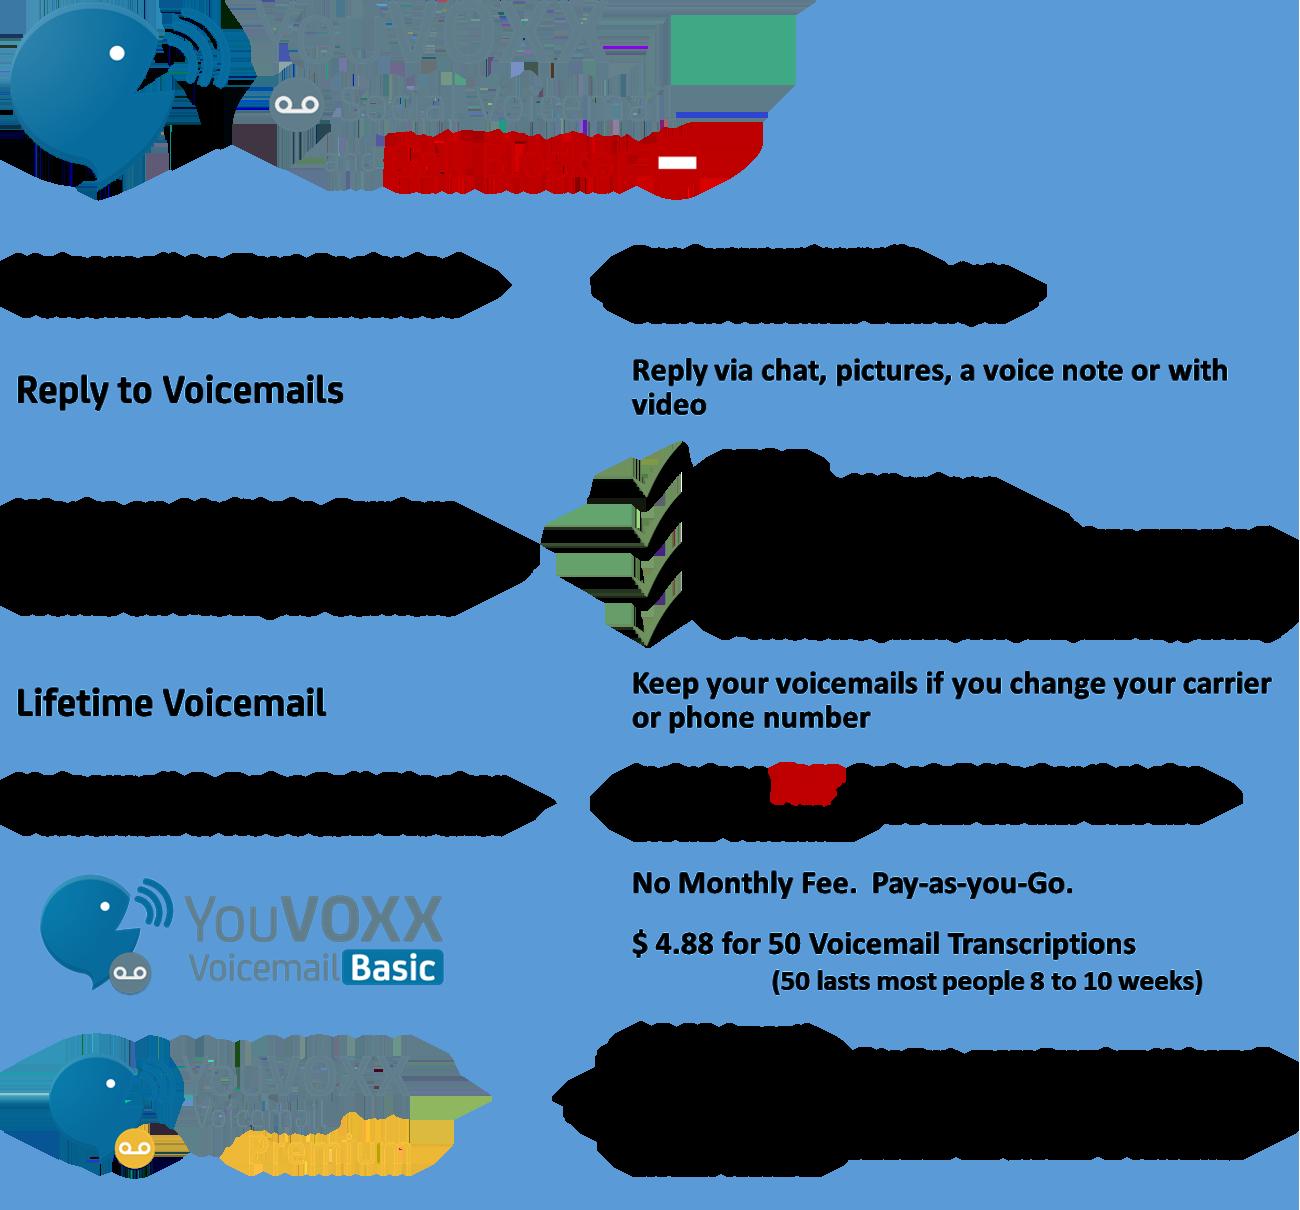 YouVOXX Voicemail Transcription app features table